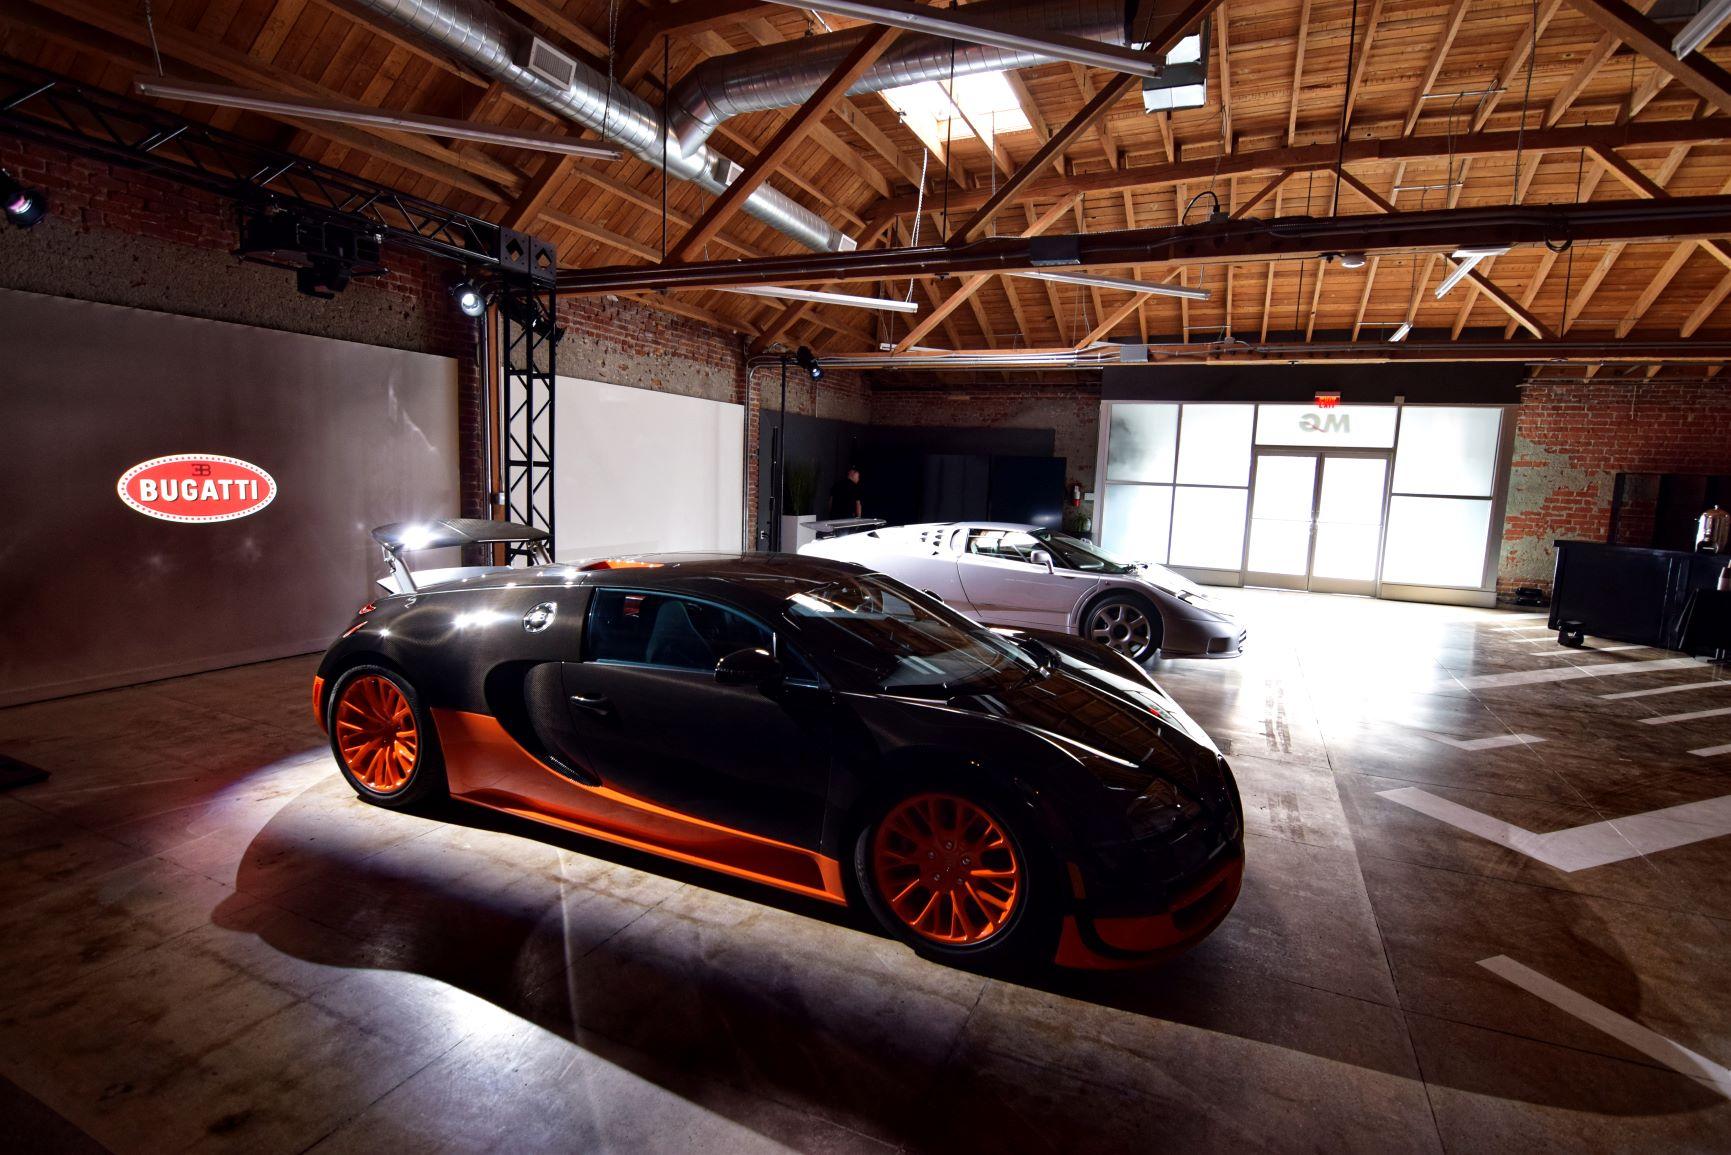 Bugatti Chiron Press Reveal Party LA Auto Show with EB110 and Veyron 16.4